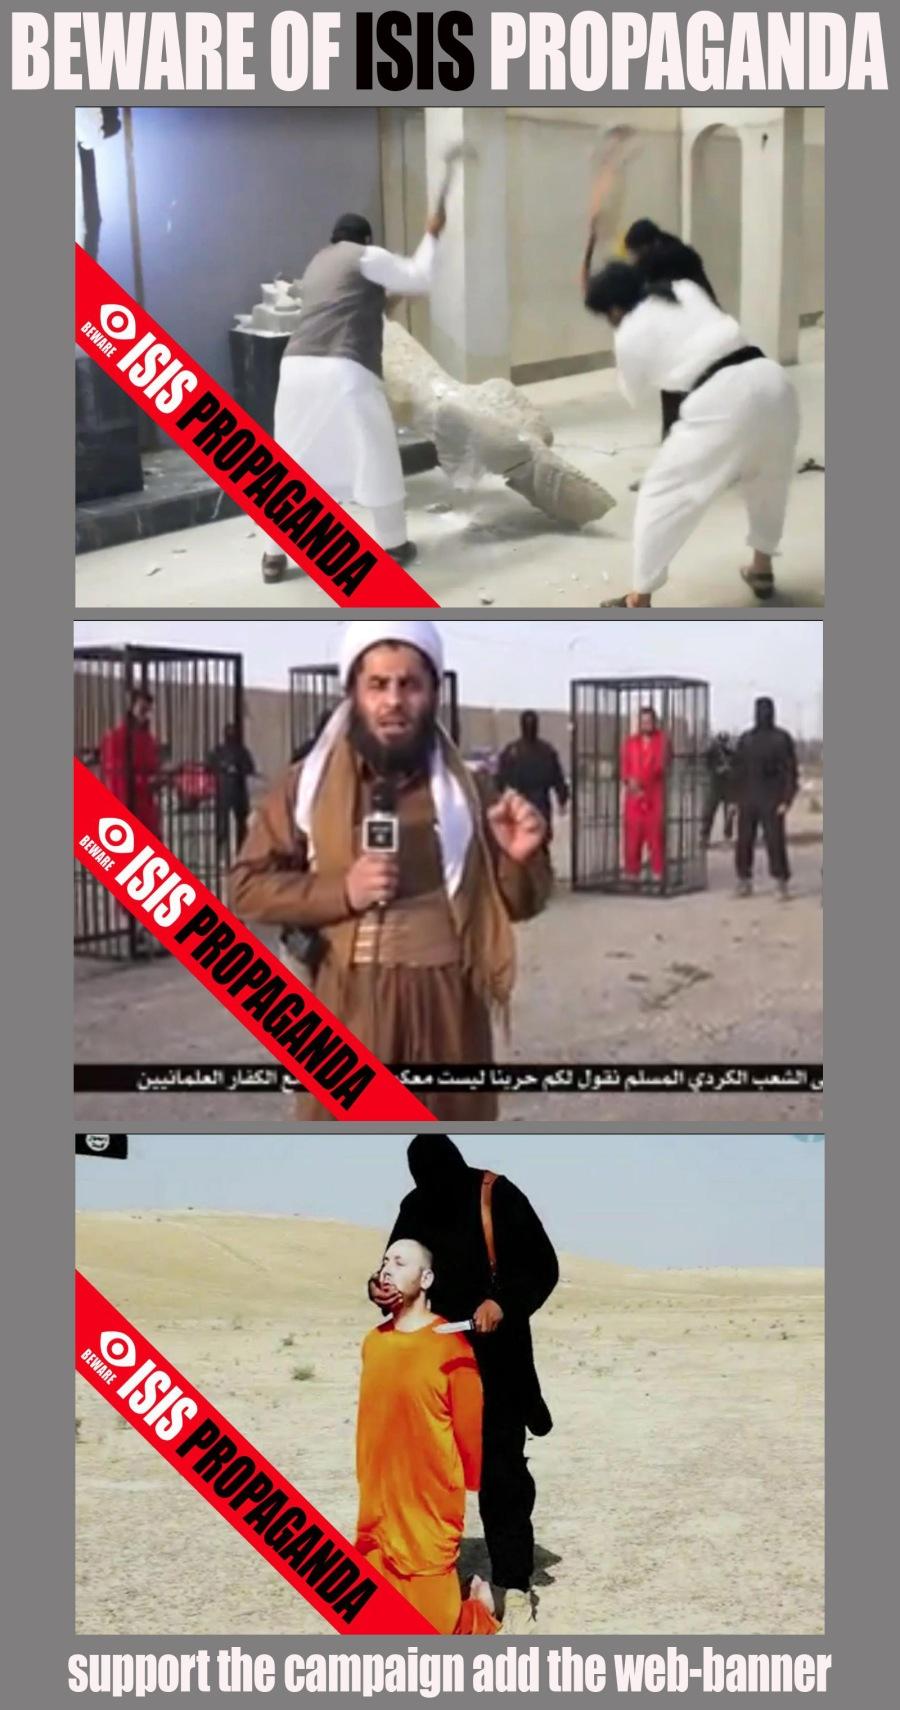 Beware_ISI-propaganda_banner